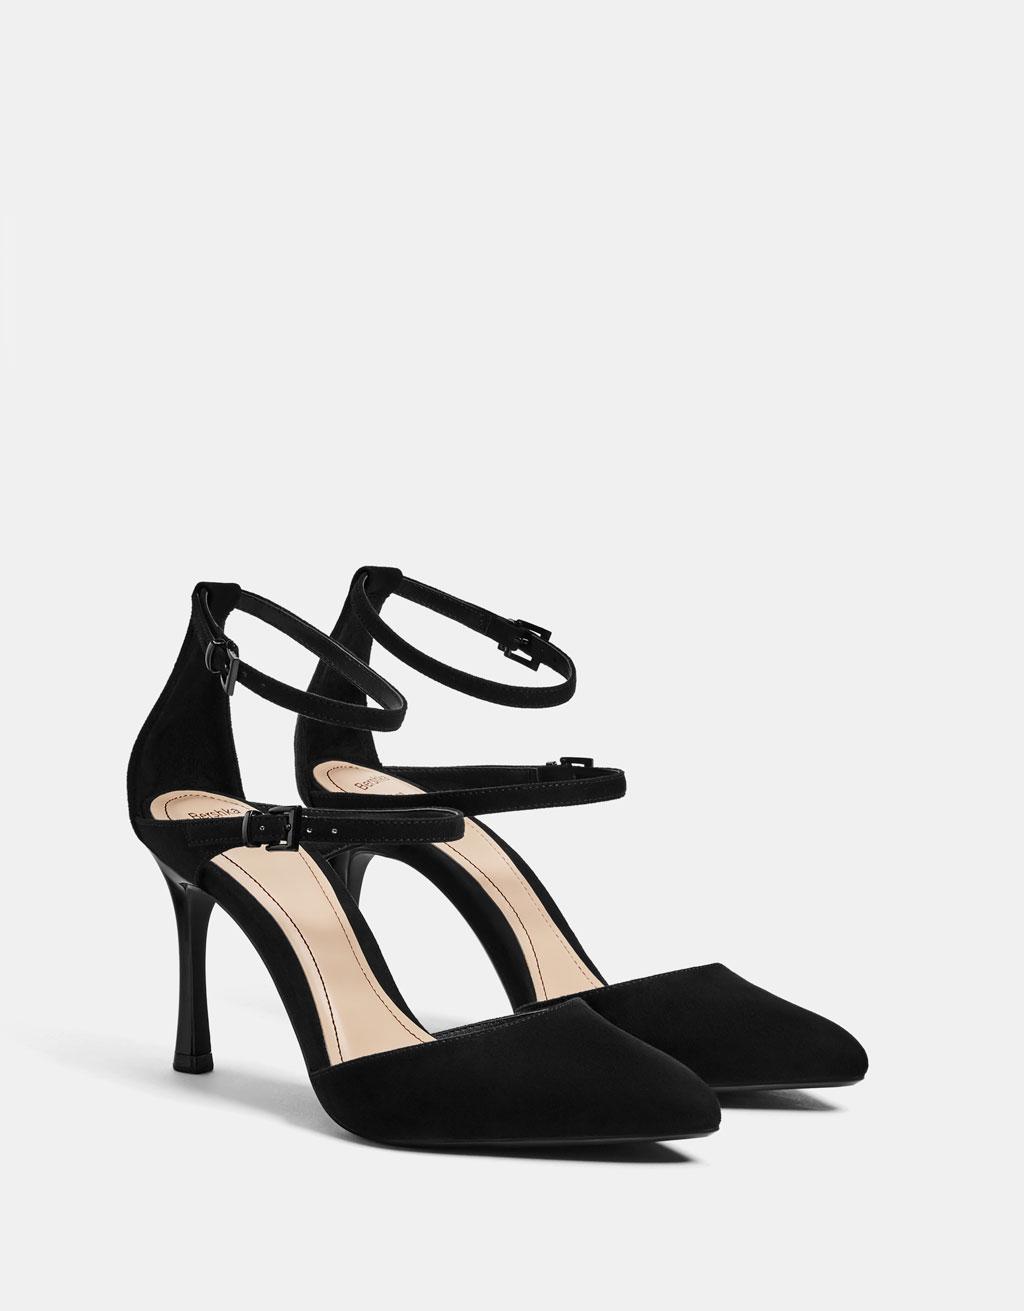 Strappy stiletto heel shoes